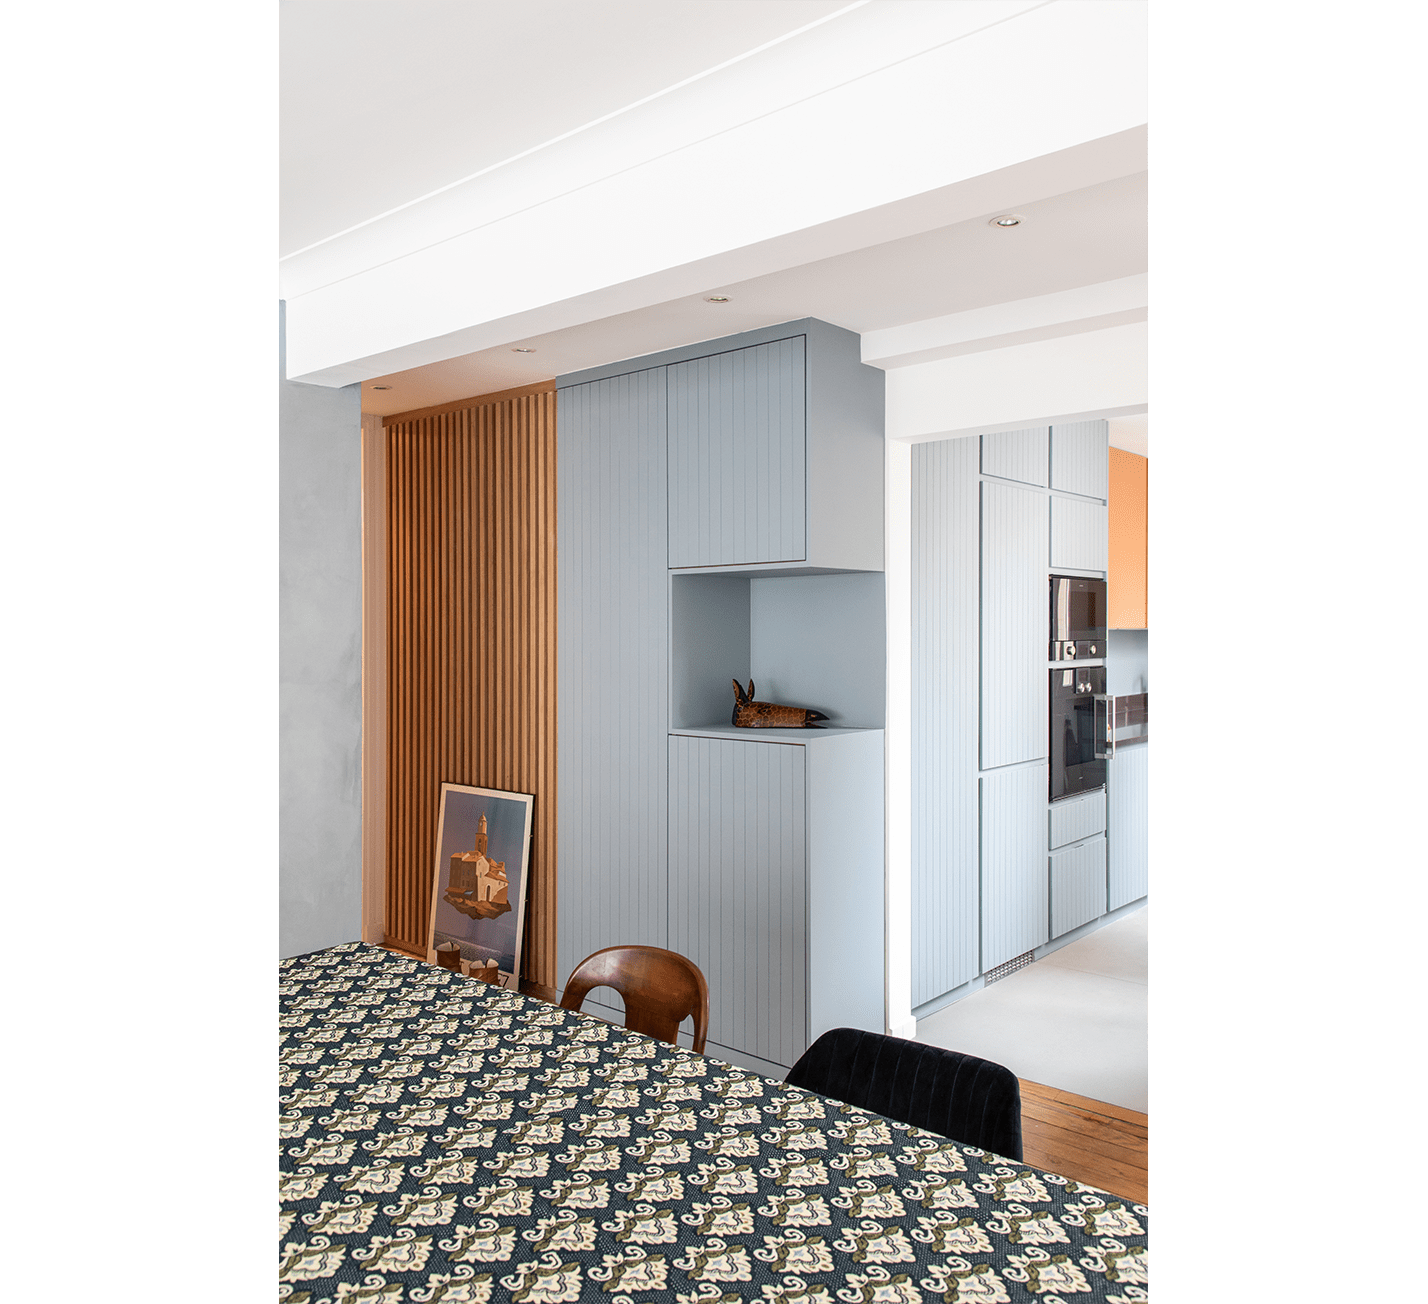 Projet-Senoch-Atelier-Steve-Pauline-Borgia-Architecte-interieur-10-min